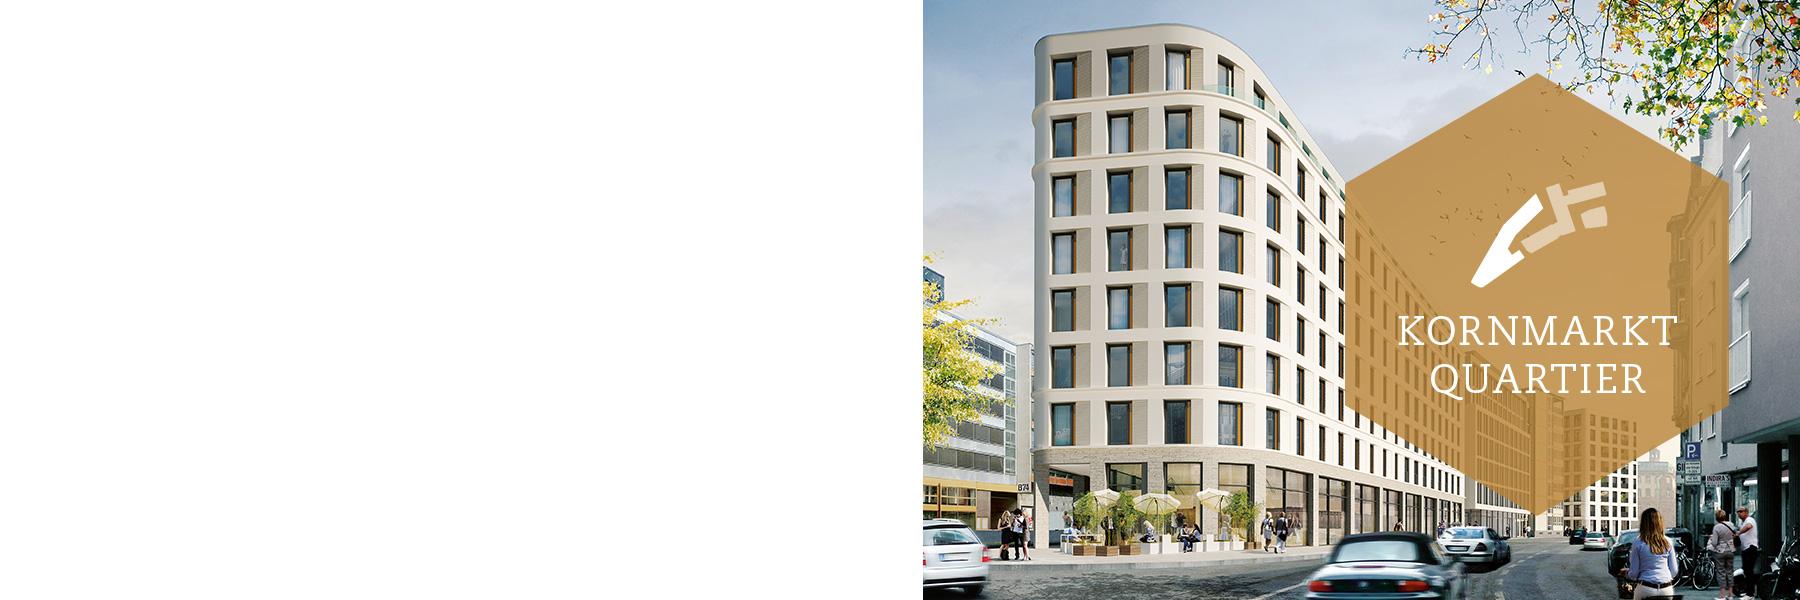 Kornmarkt Arkaden Frankfurt – Quartier